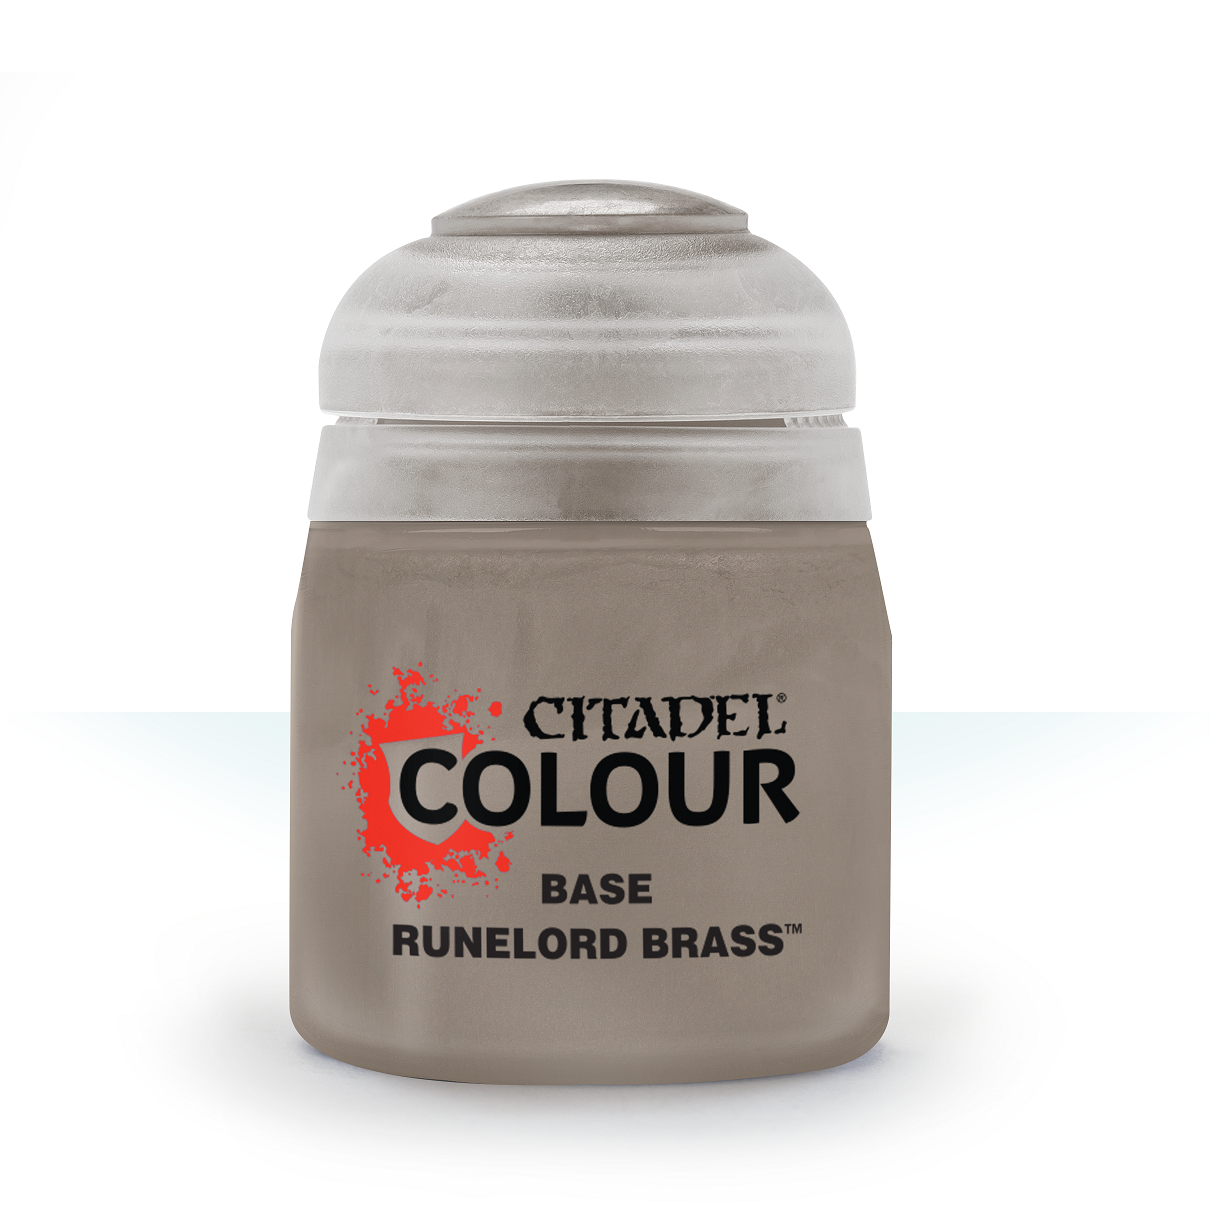 Citadel Base Runelord Brass (12ml)